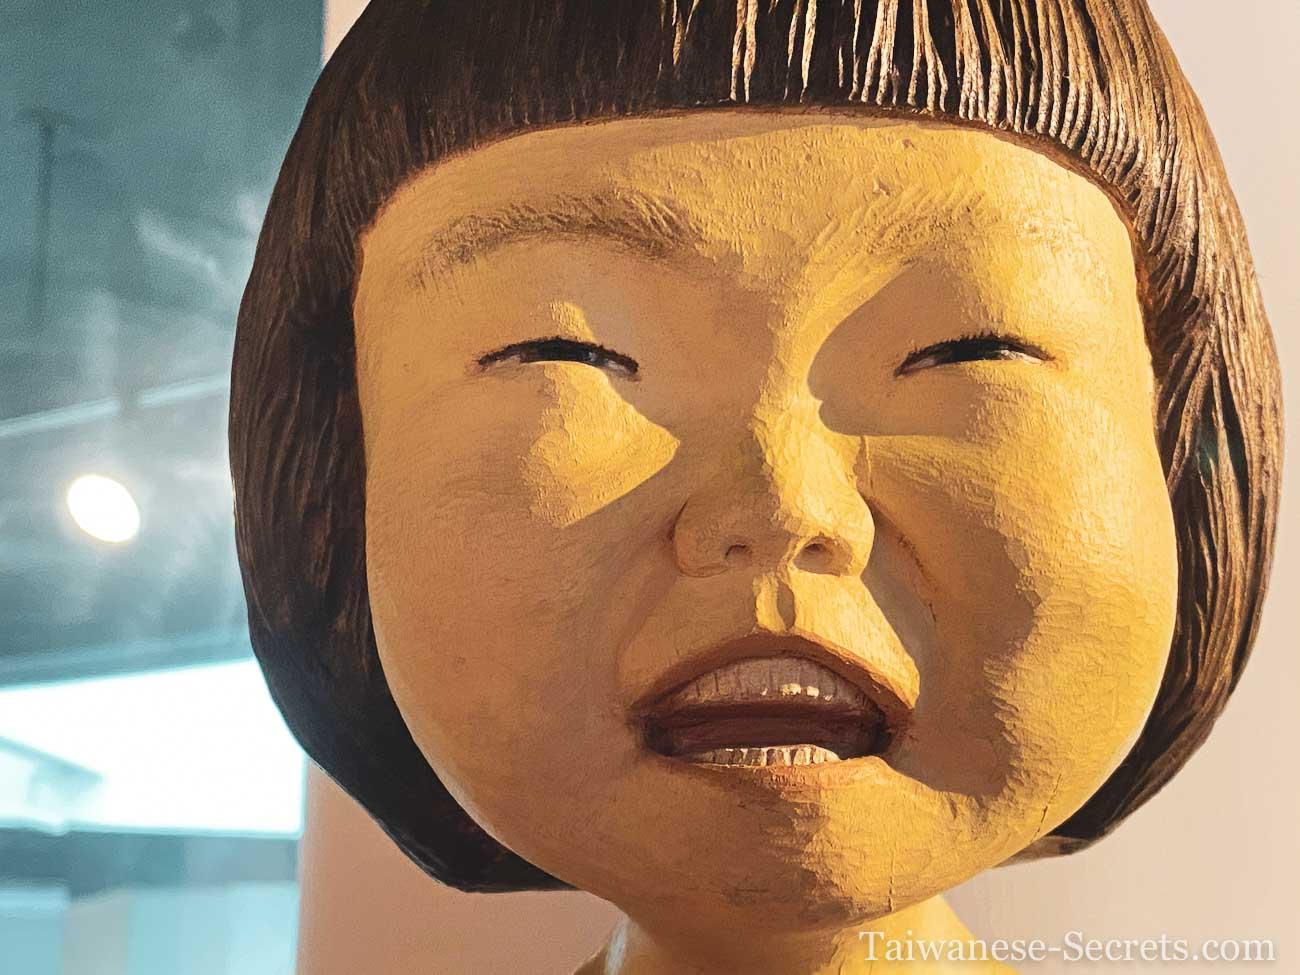 sanyi wood sculpture